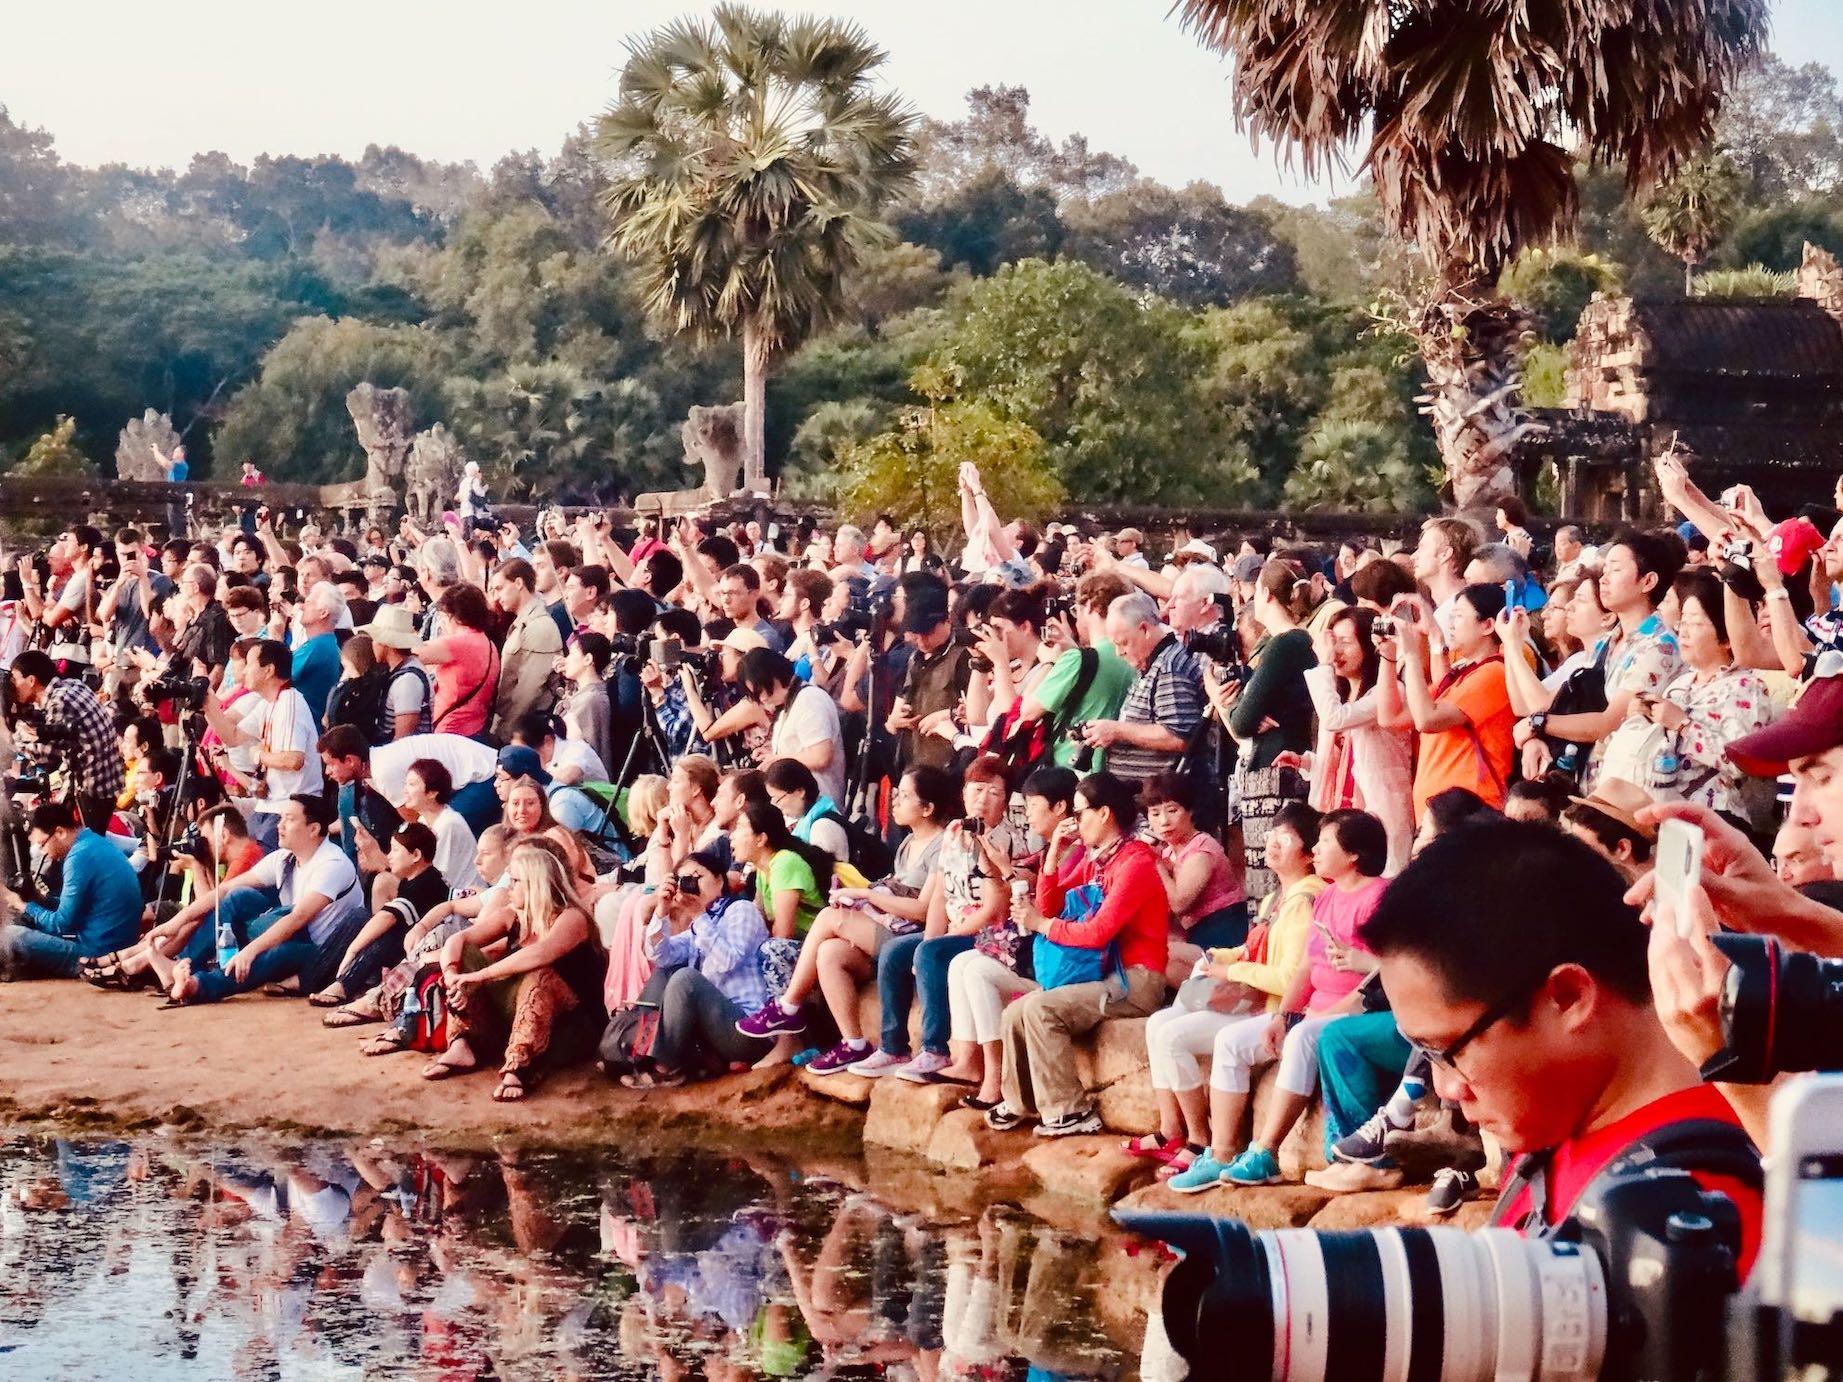 Photographers Sunset at Angkor Wat